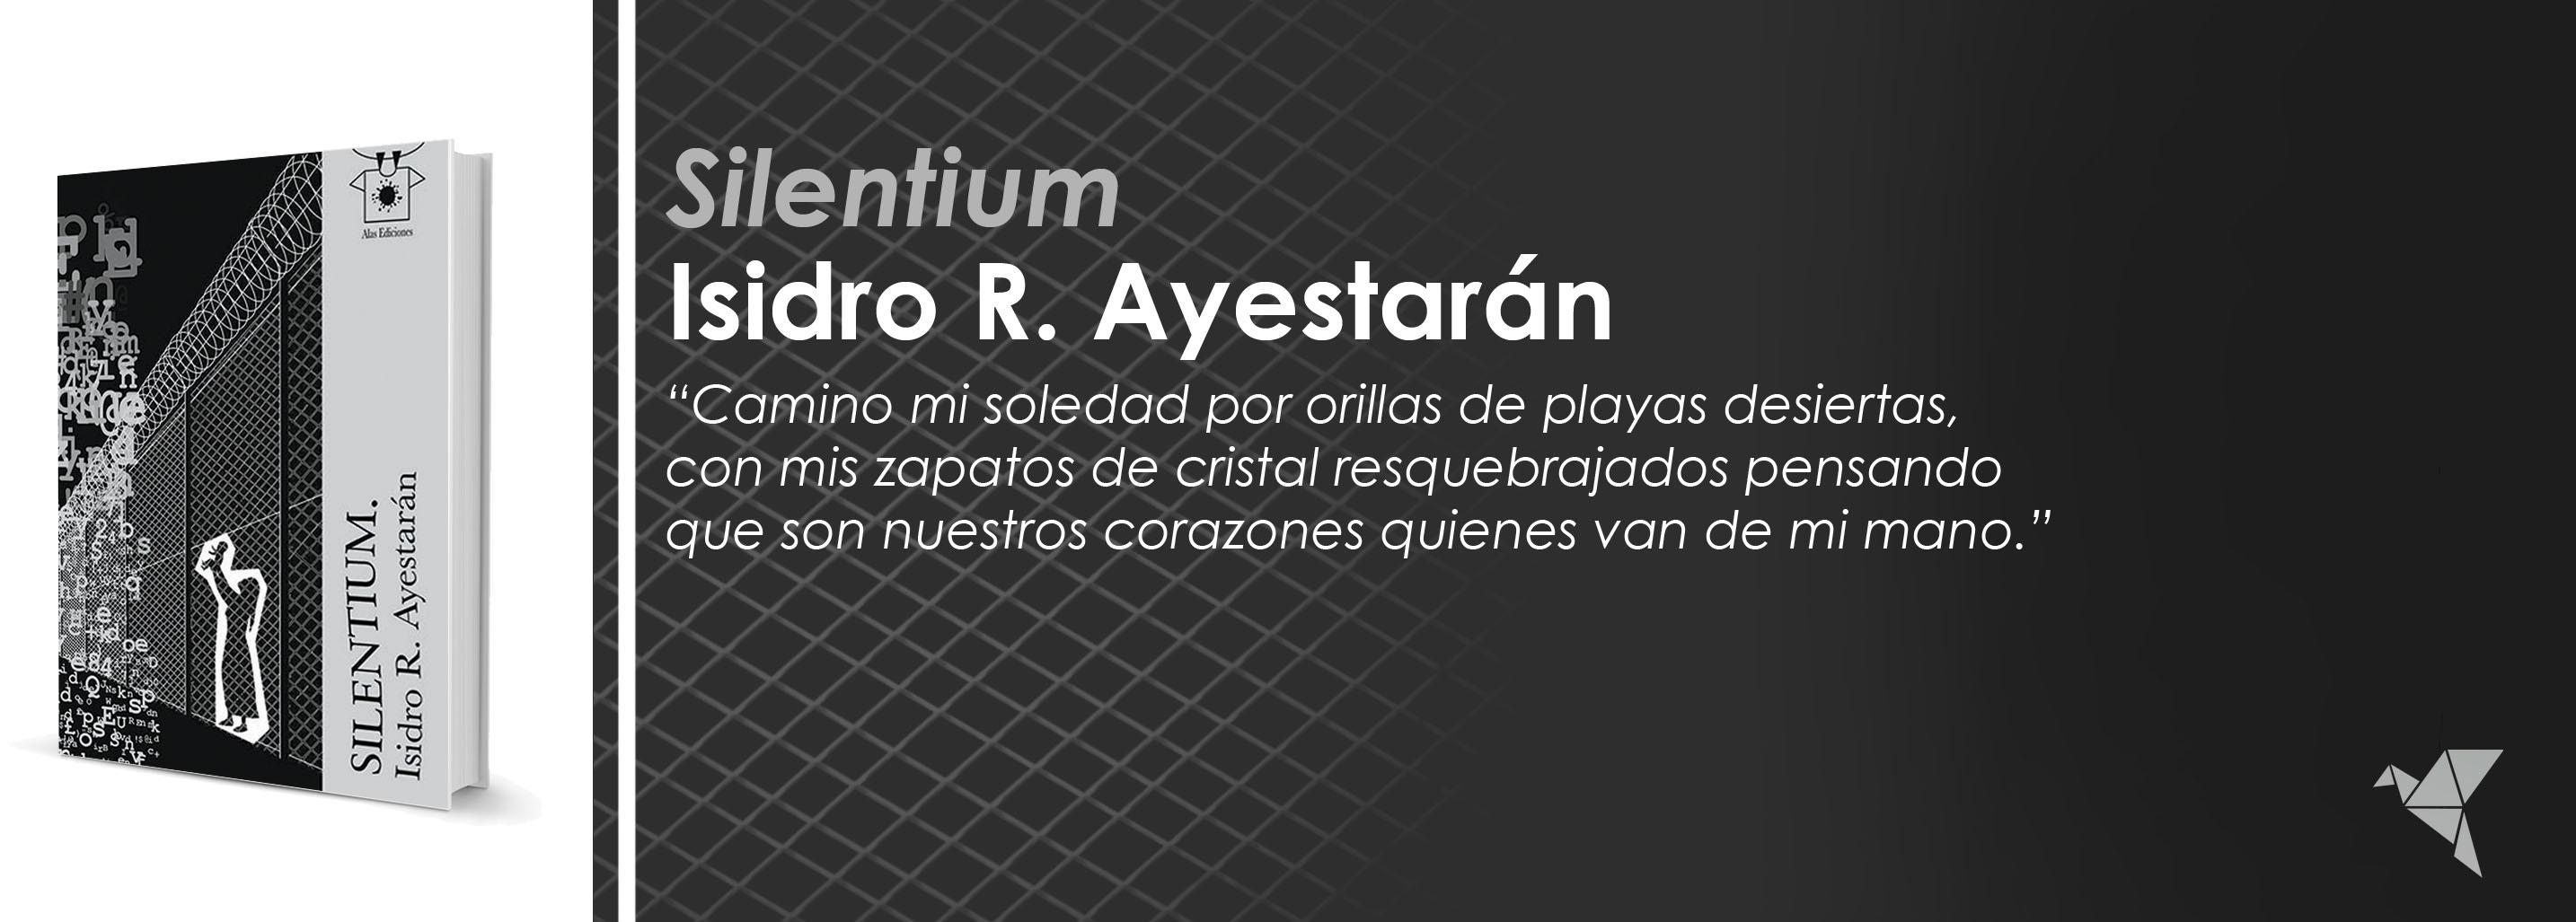 Silentium, de Isidro R. Ayestarán